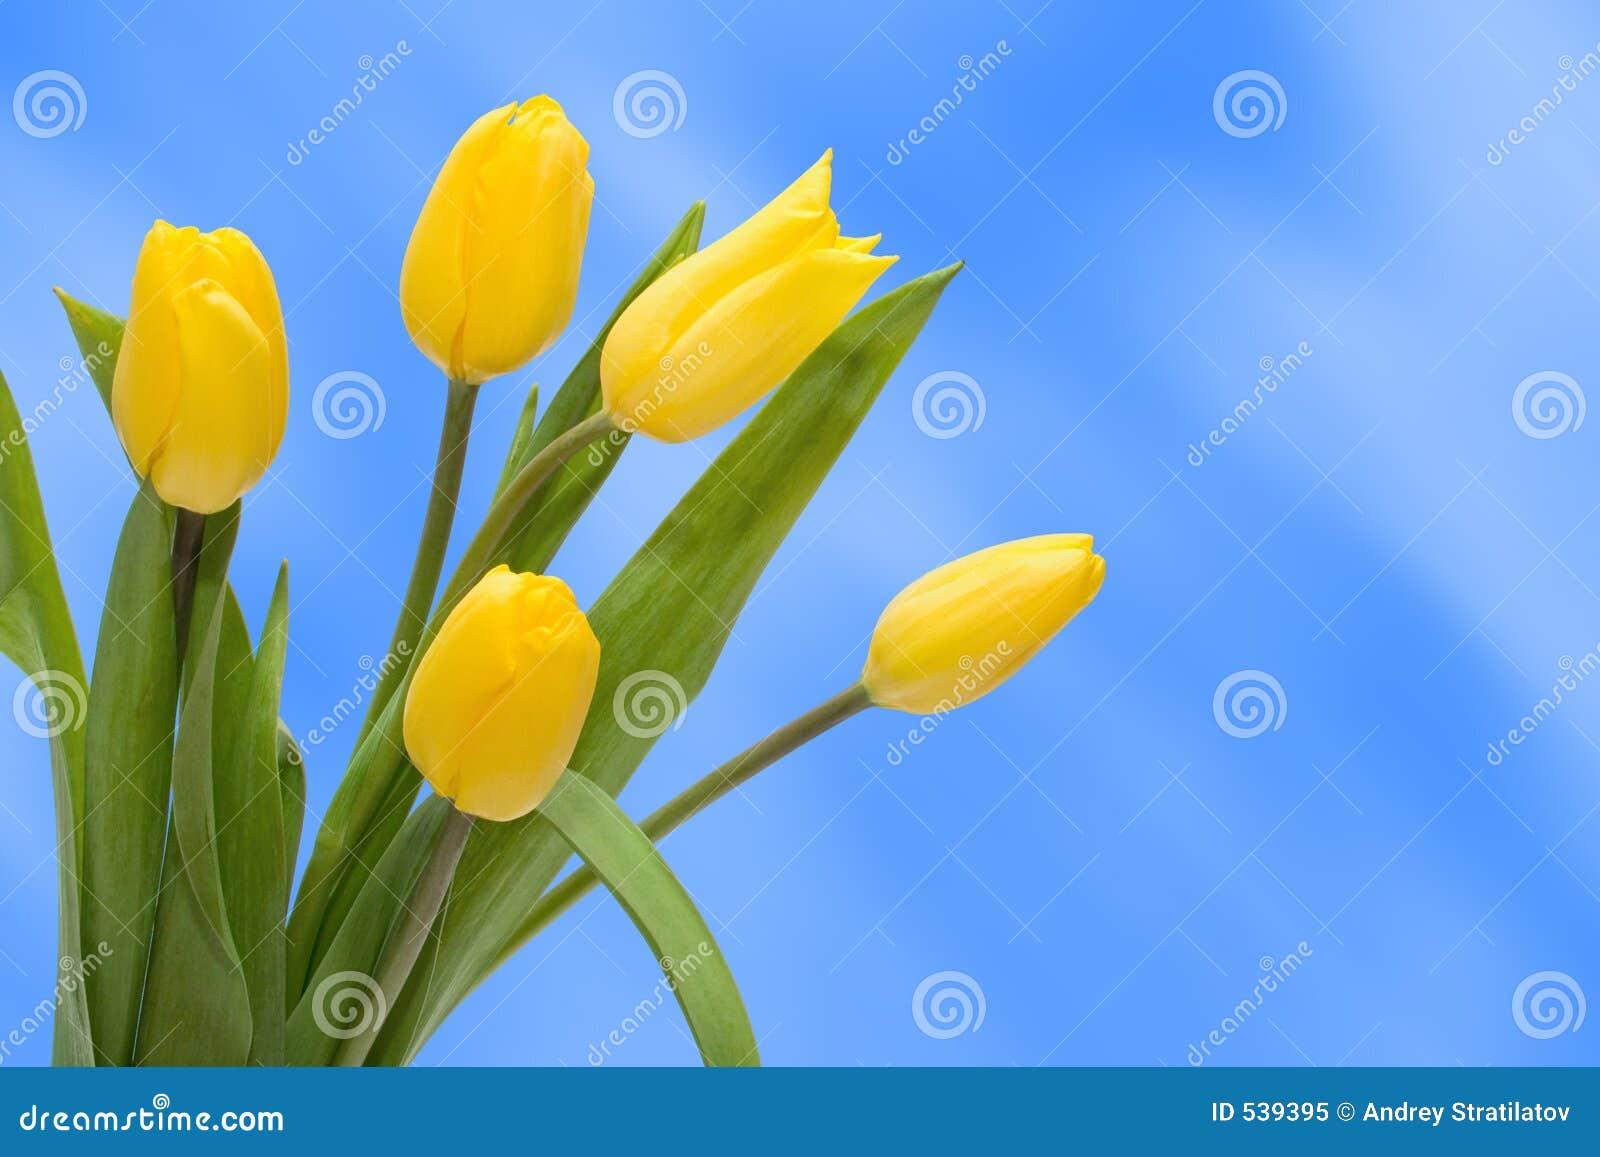 Tulipán del ramo